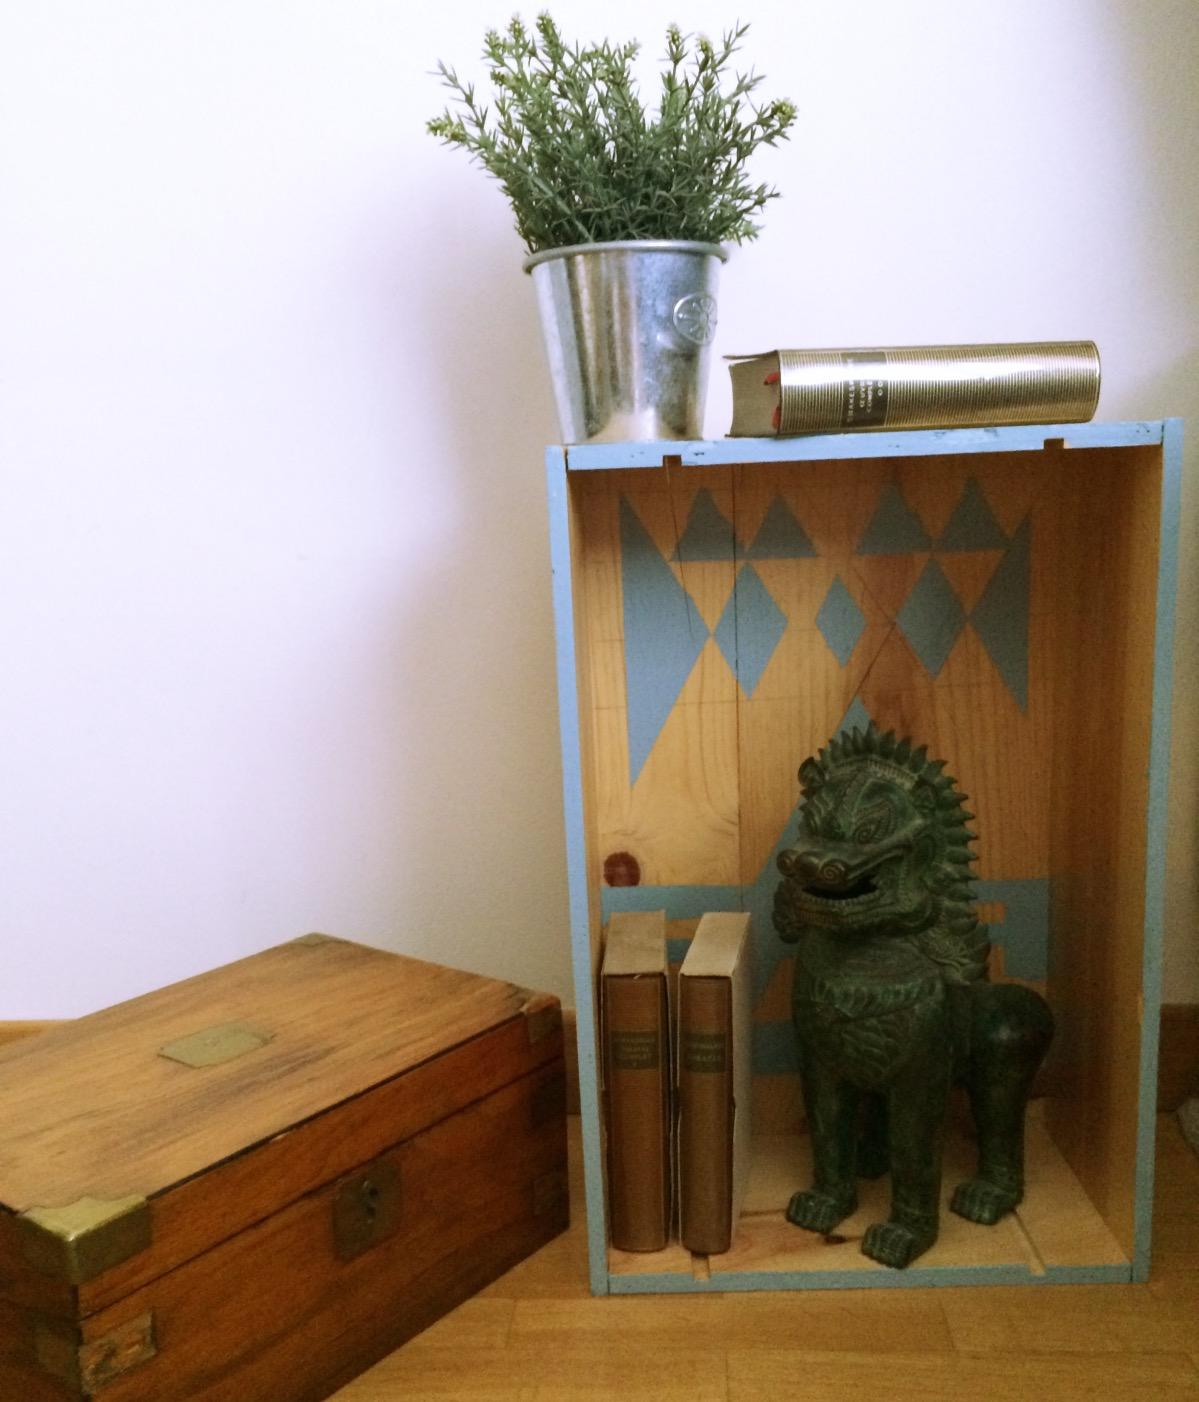 diy une table de chevet en caisse vin blog d co blog diy clem around the corner. Black Bedroom Furniture Sets. Home Design Ideas